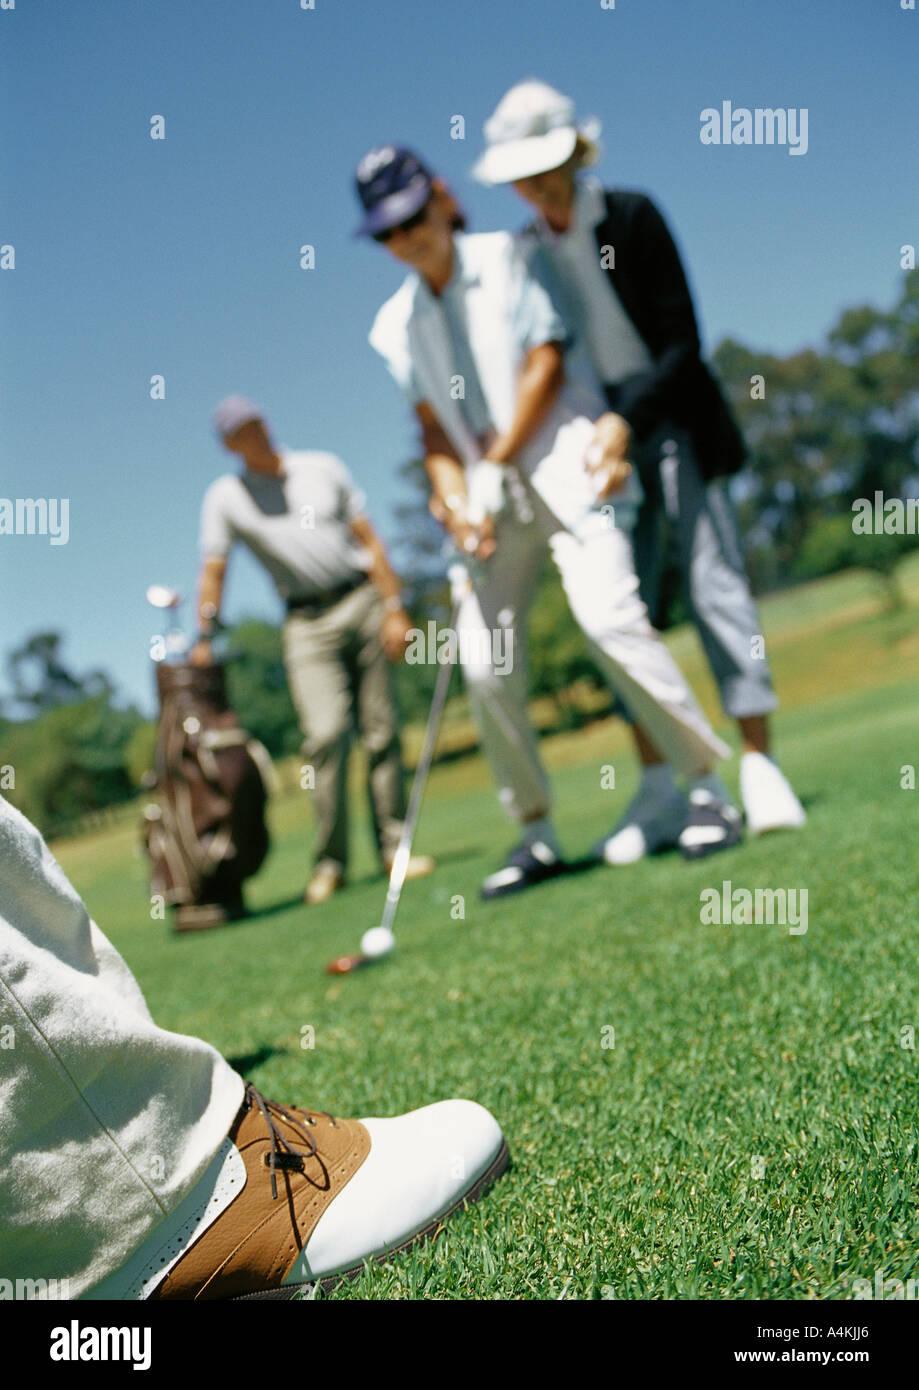 Golfers - Stock Image